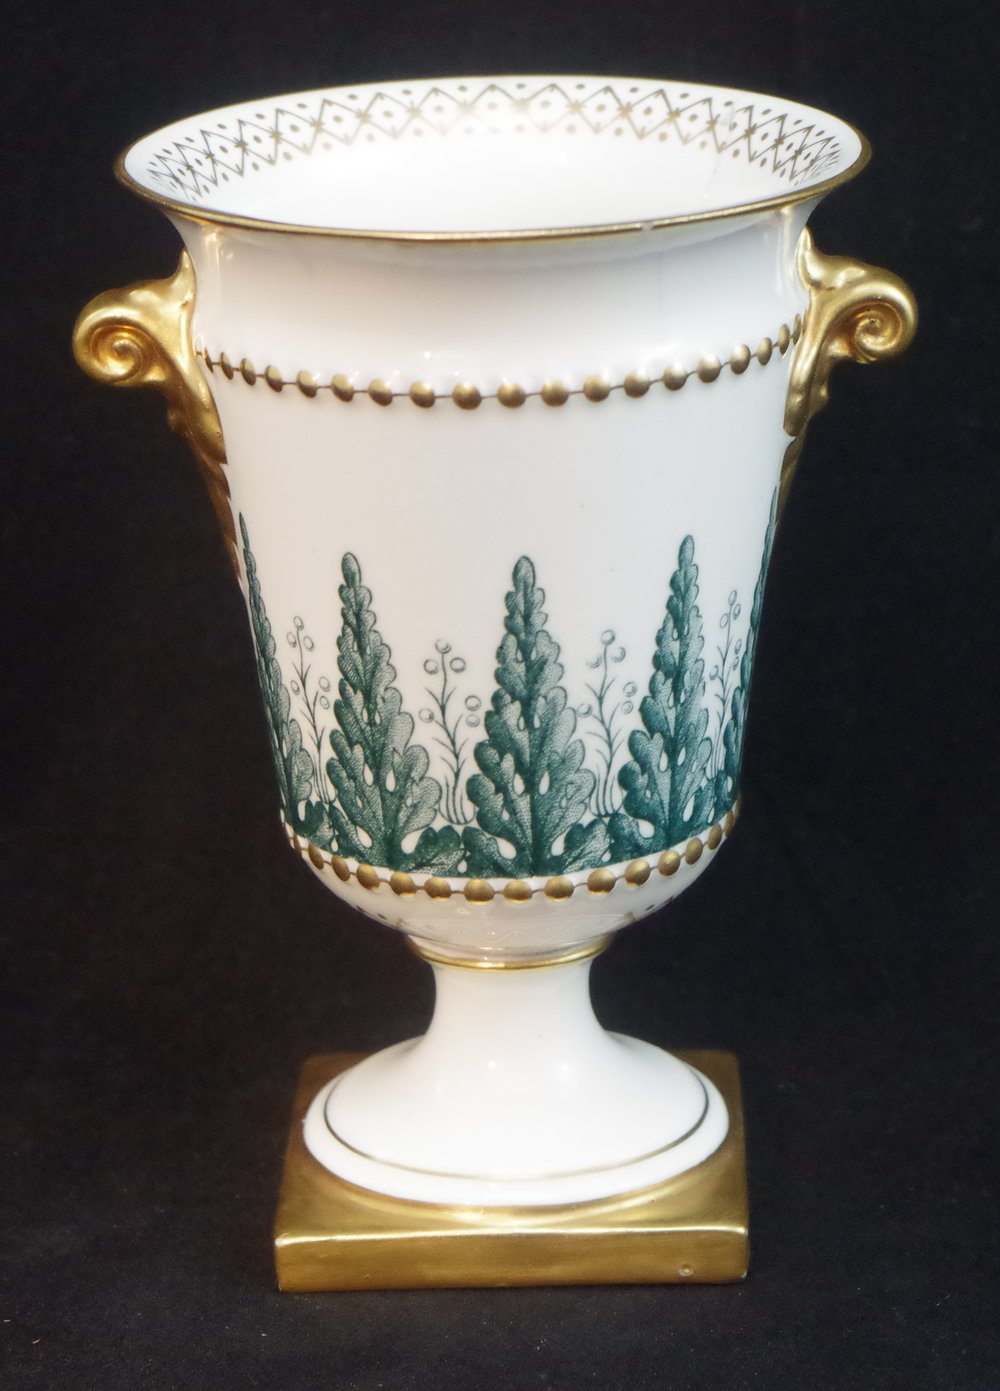 royal-crown-derby-vase-green-trees